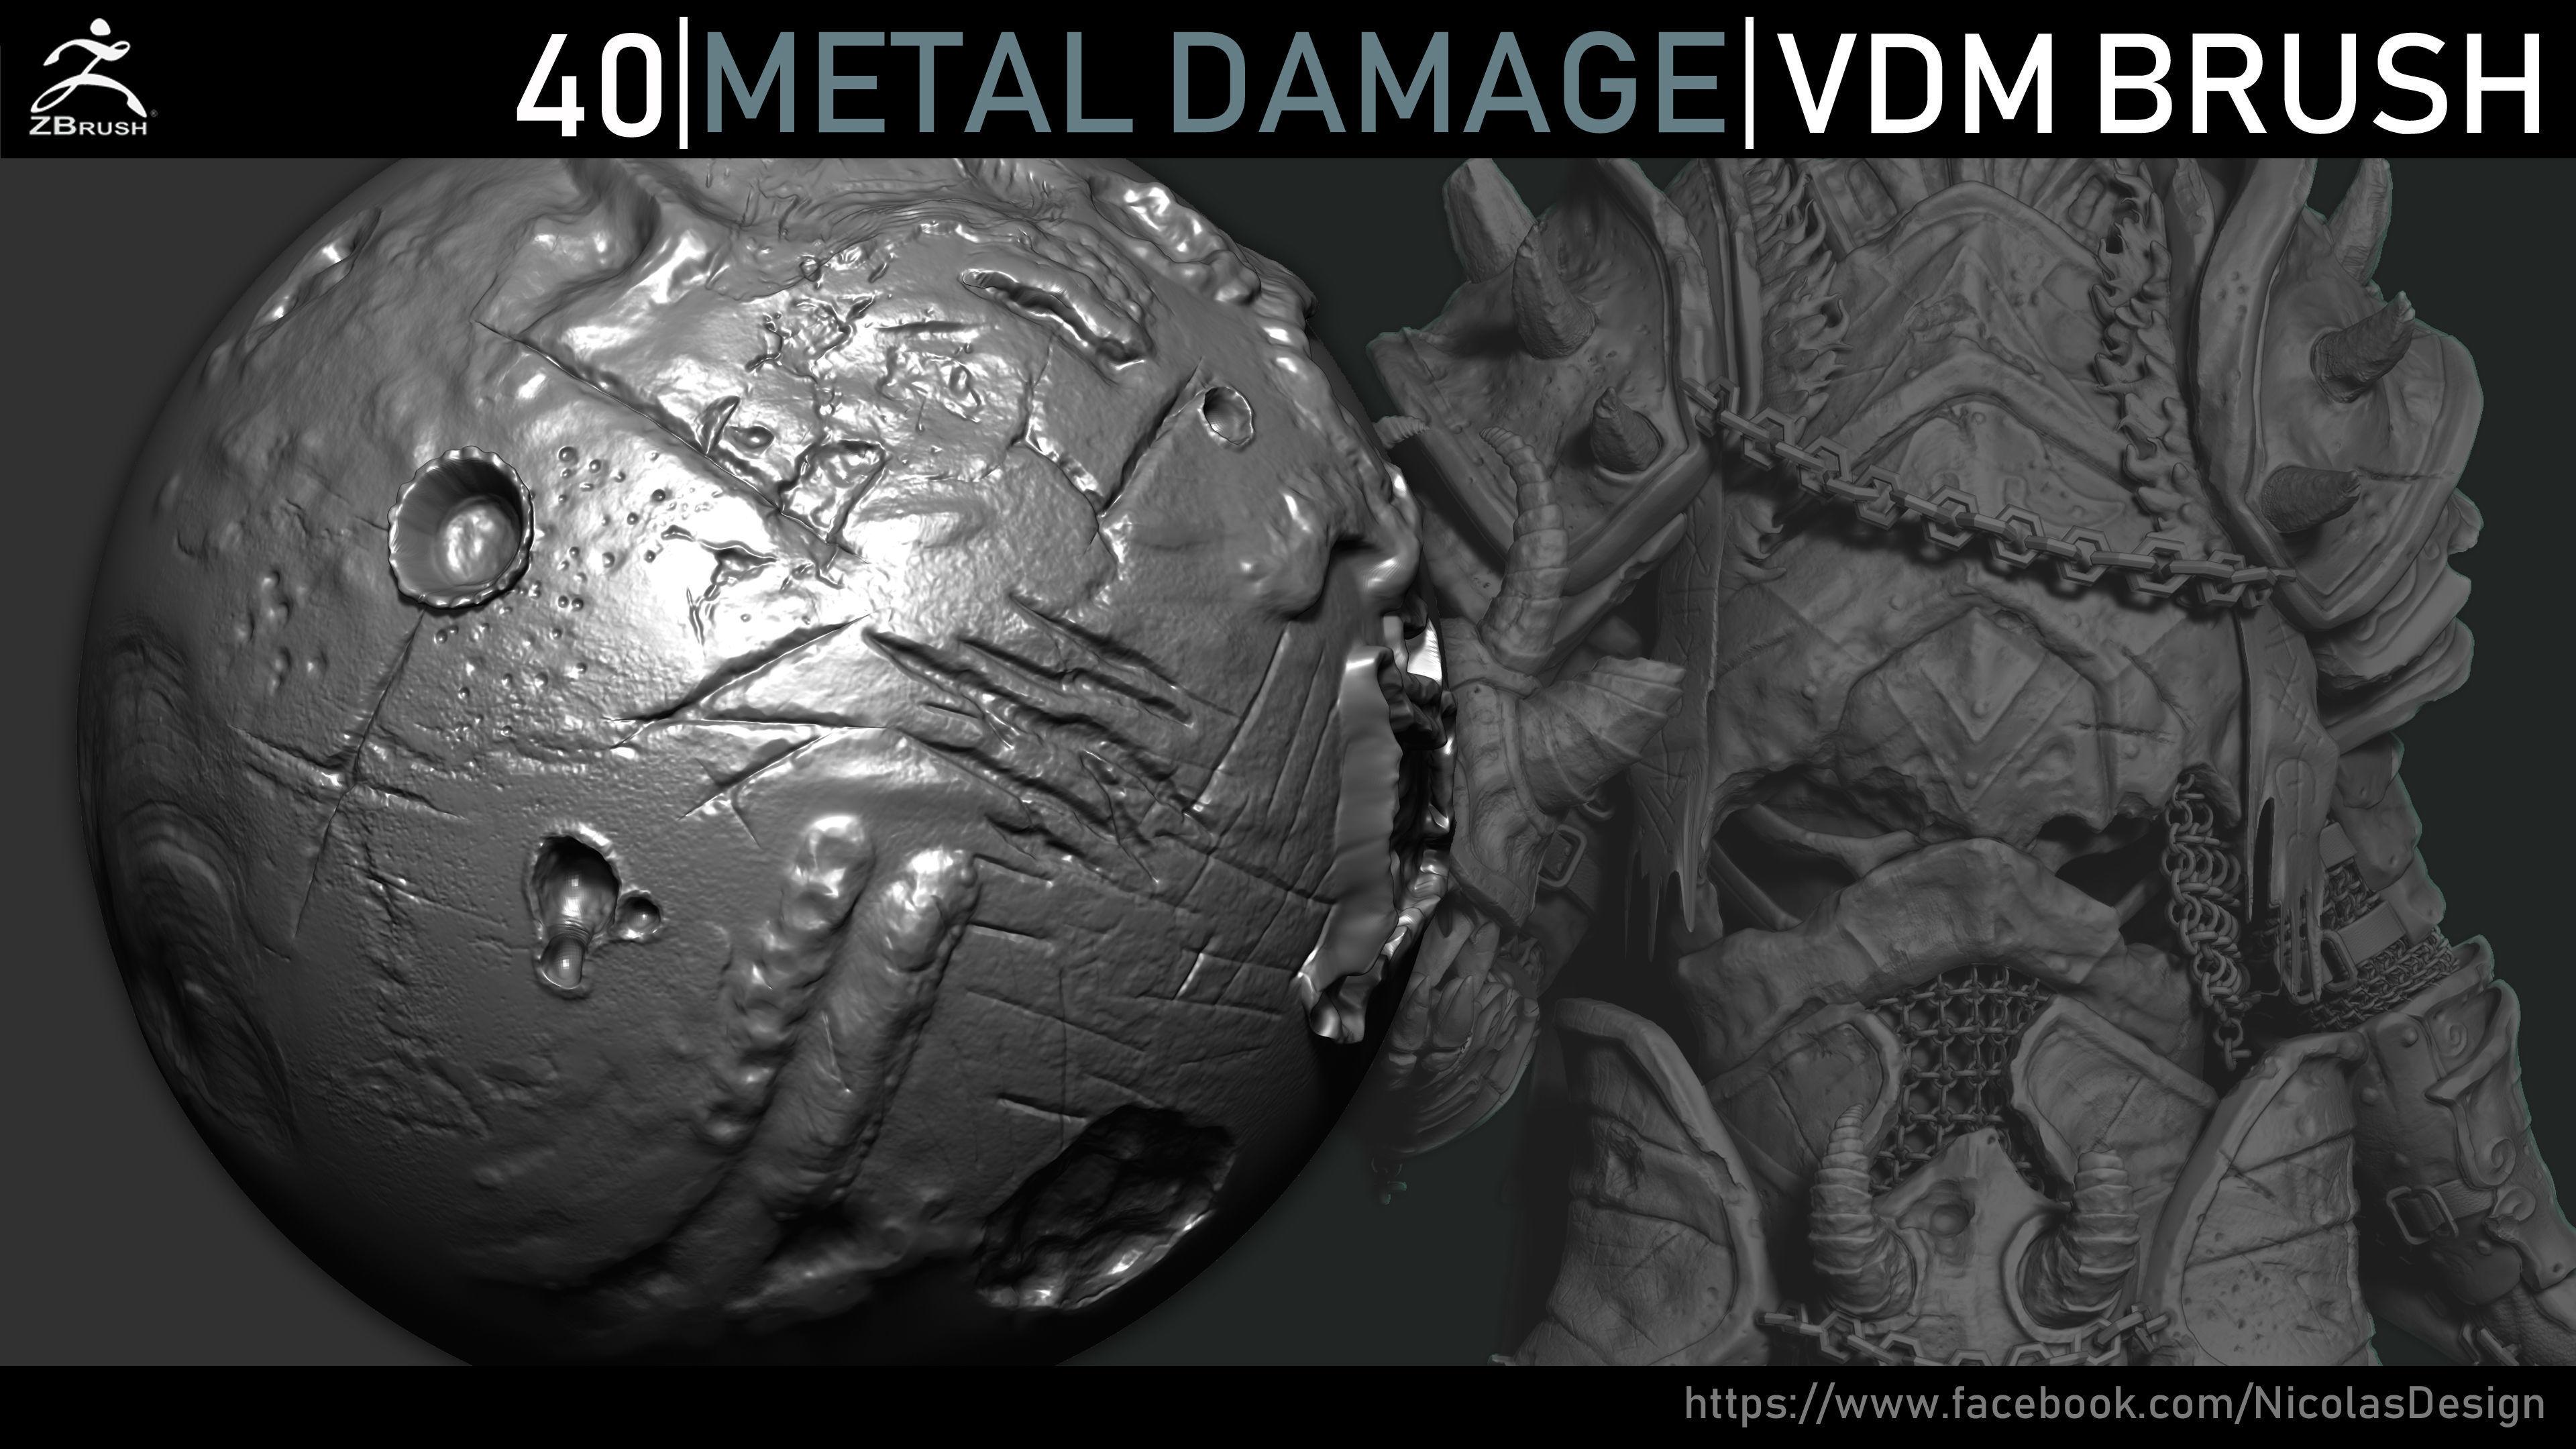 Zbrush - Metal Damage VDM Brush